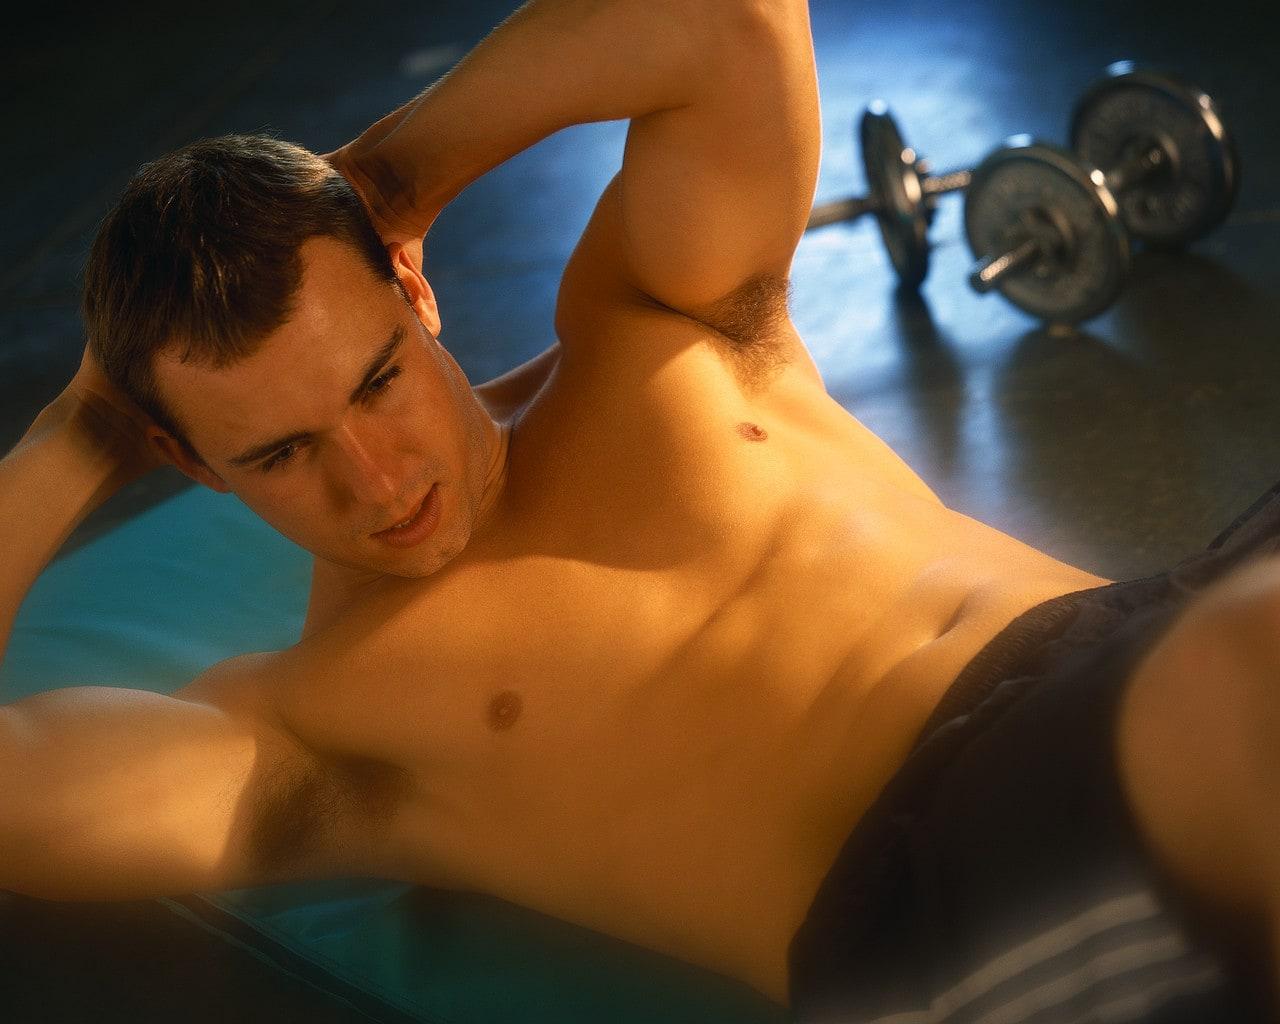 rutina de ejercicios en casa para expertos